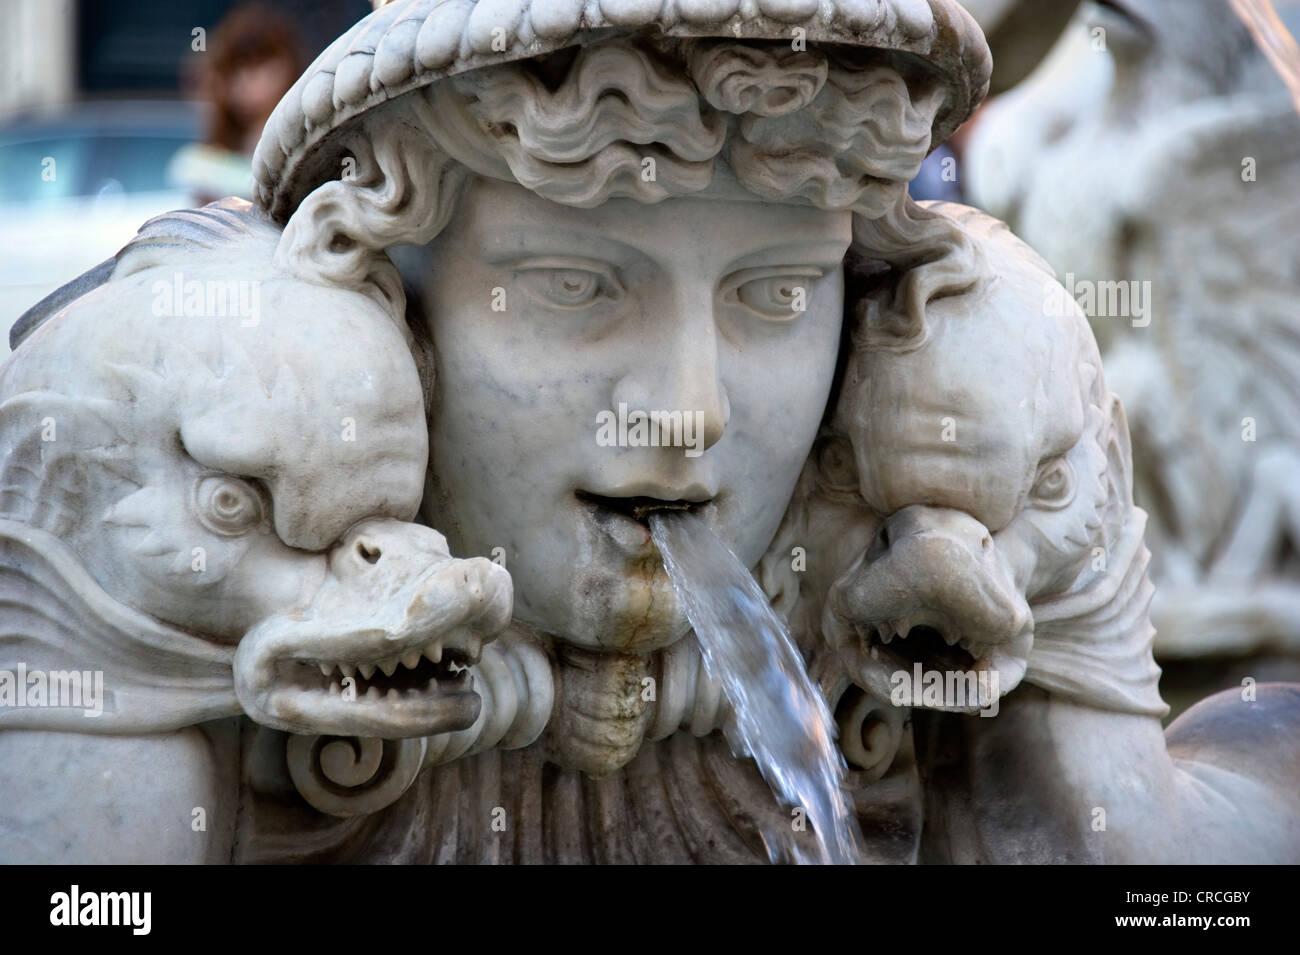 Fountain figure, sea figure with fish, Fontana del Moro or Moor Fountain, Piazza Navona, Rome, Lazio, Italy, Europe - Stock Image